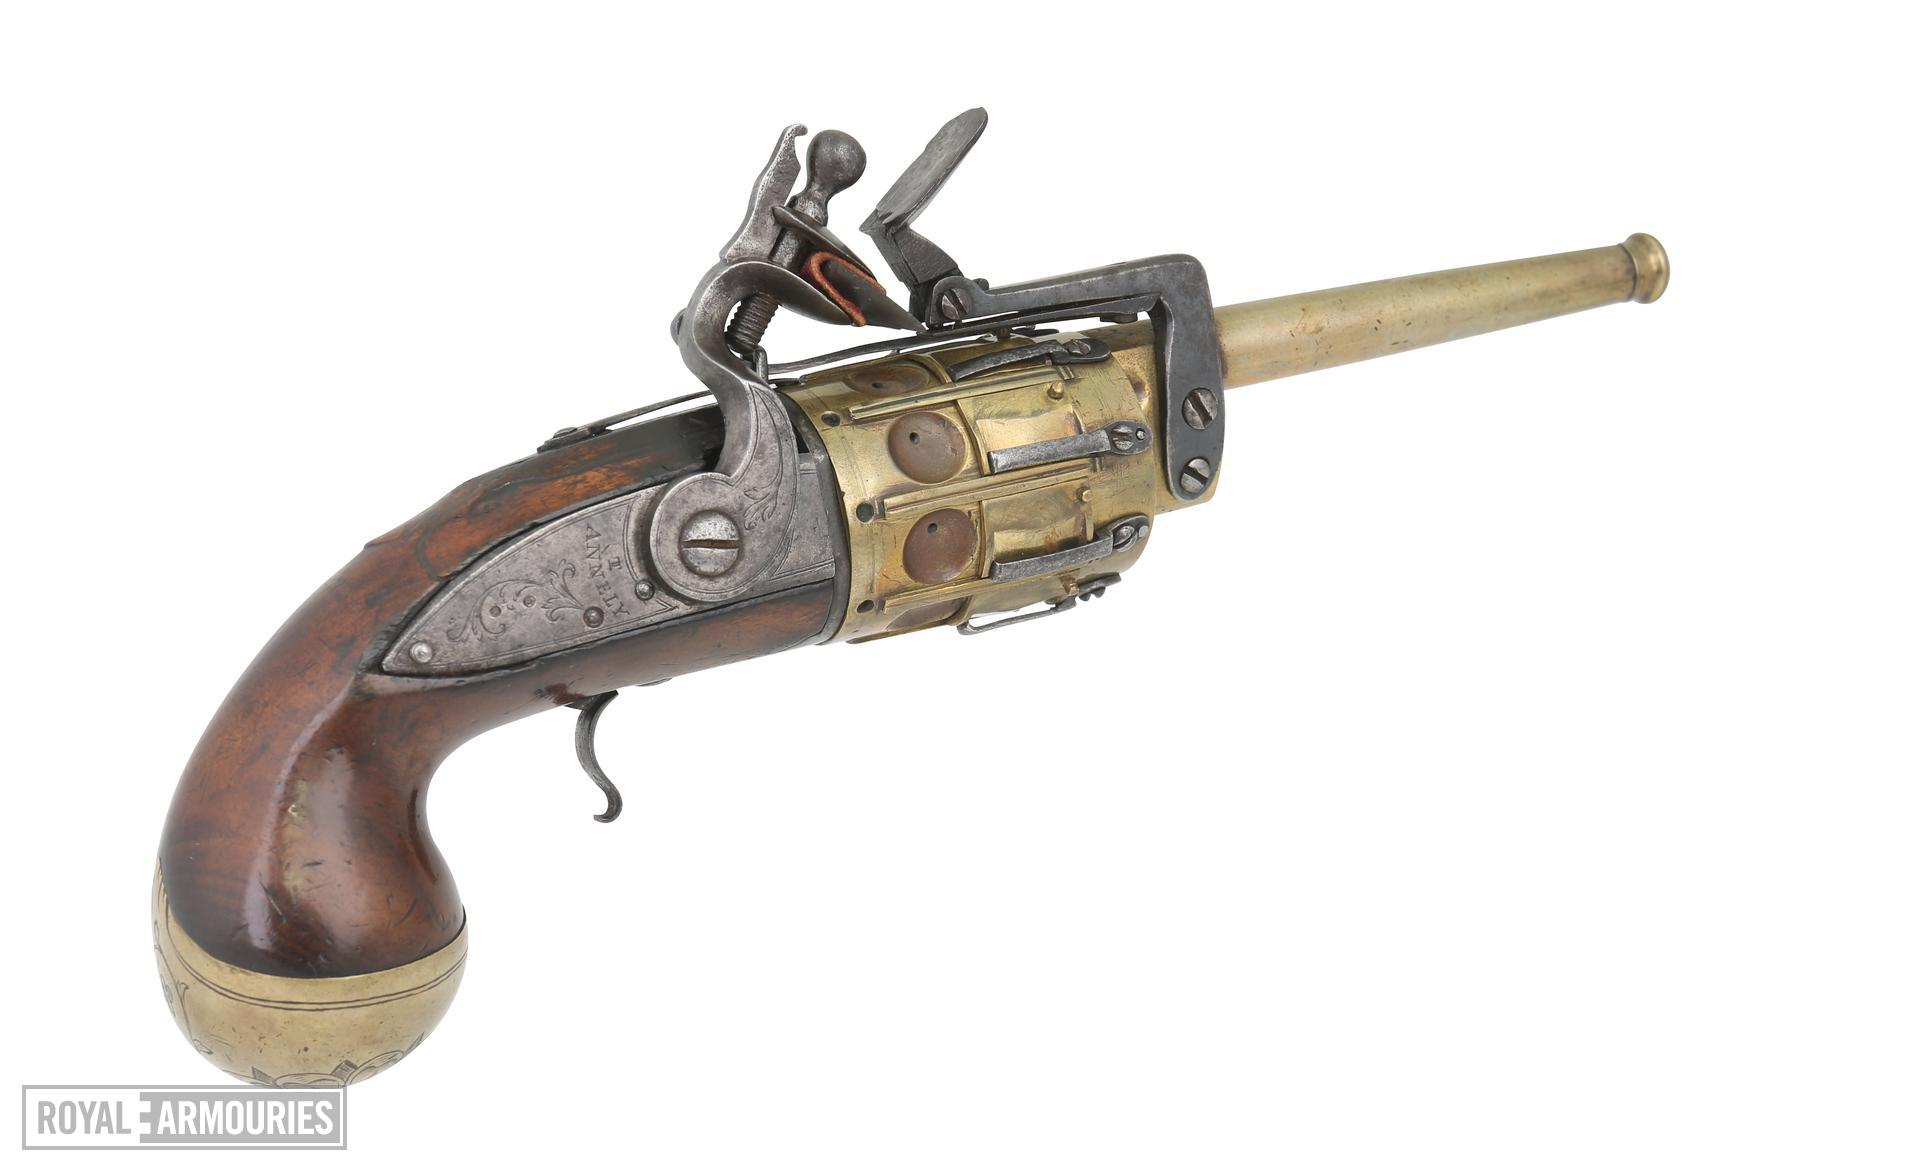 Snaphaunce revolver - Annely pattern